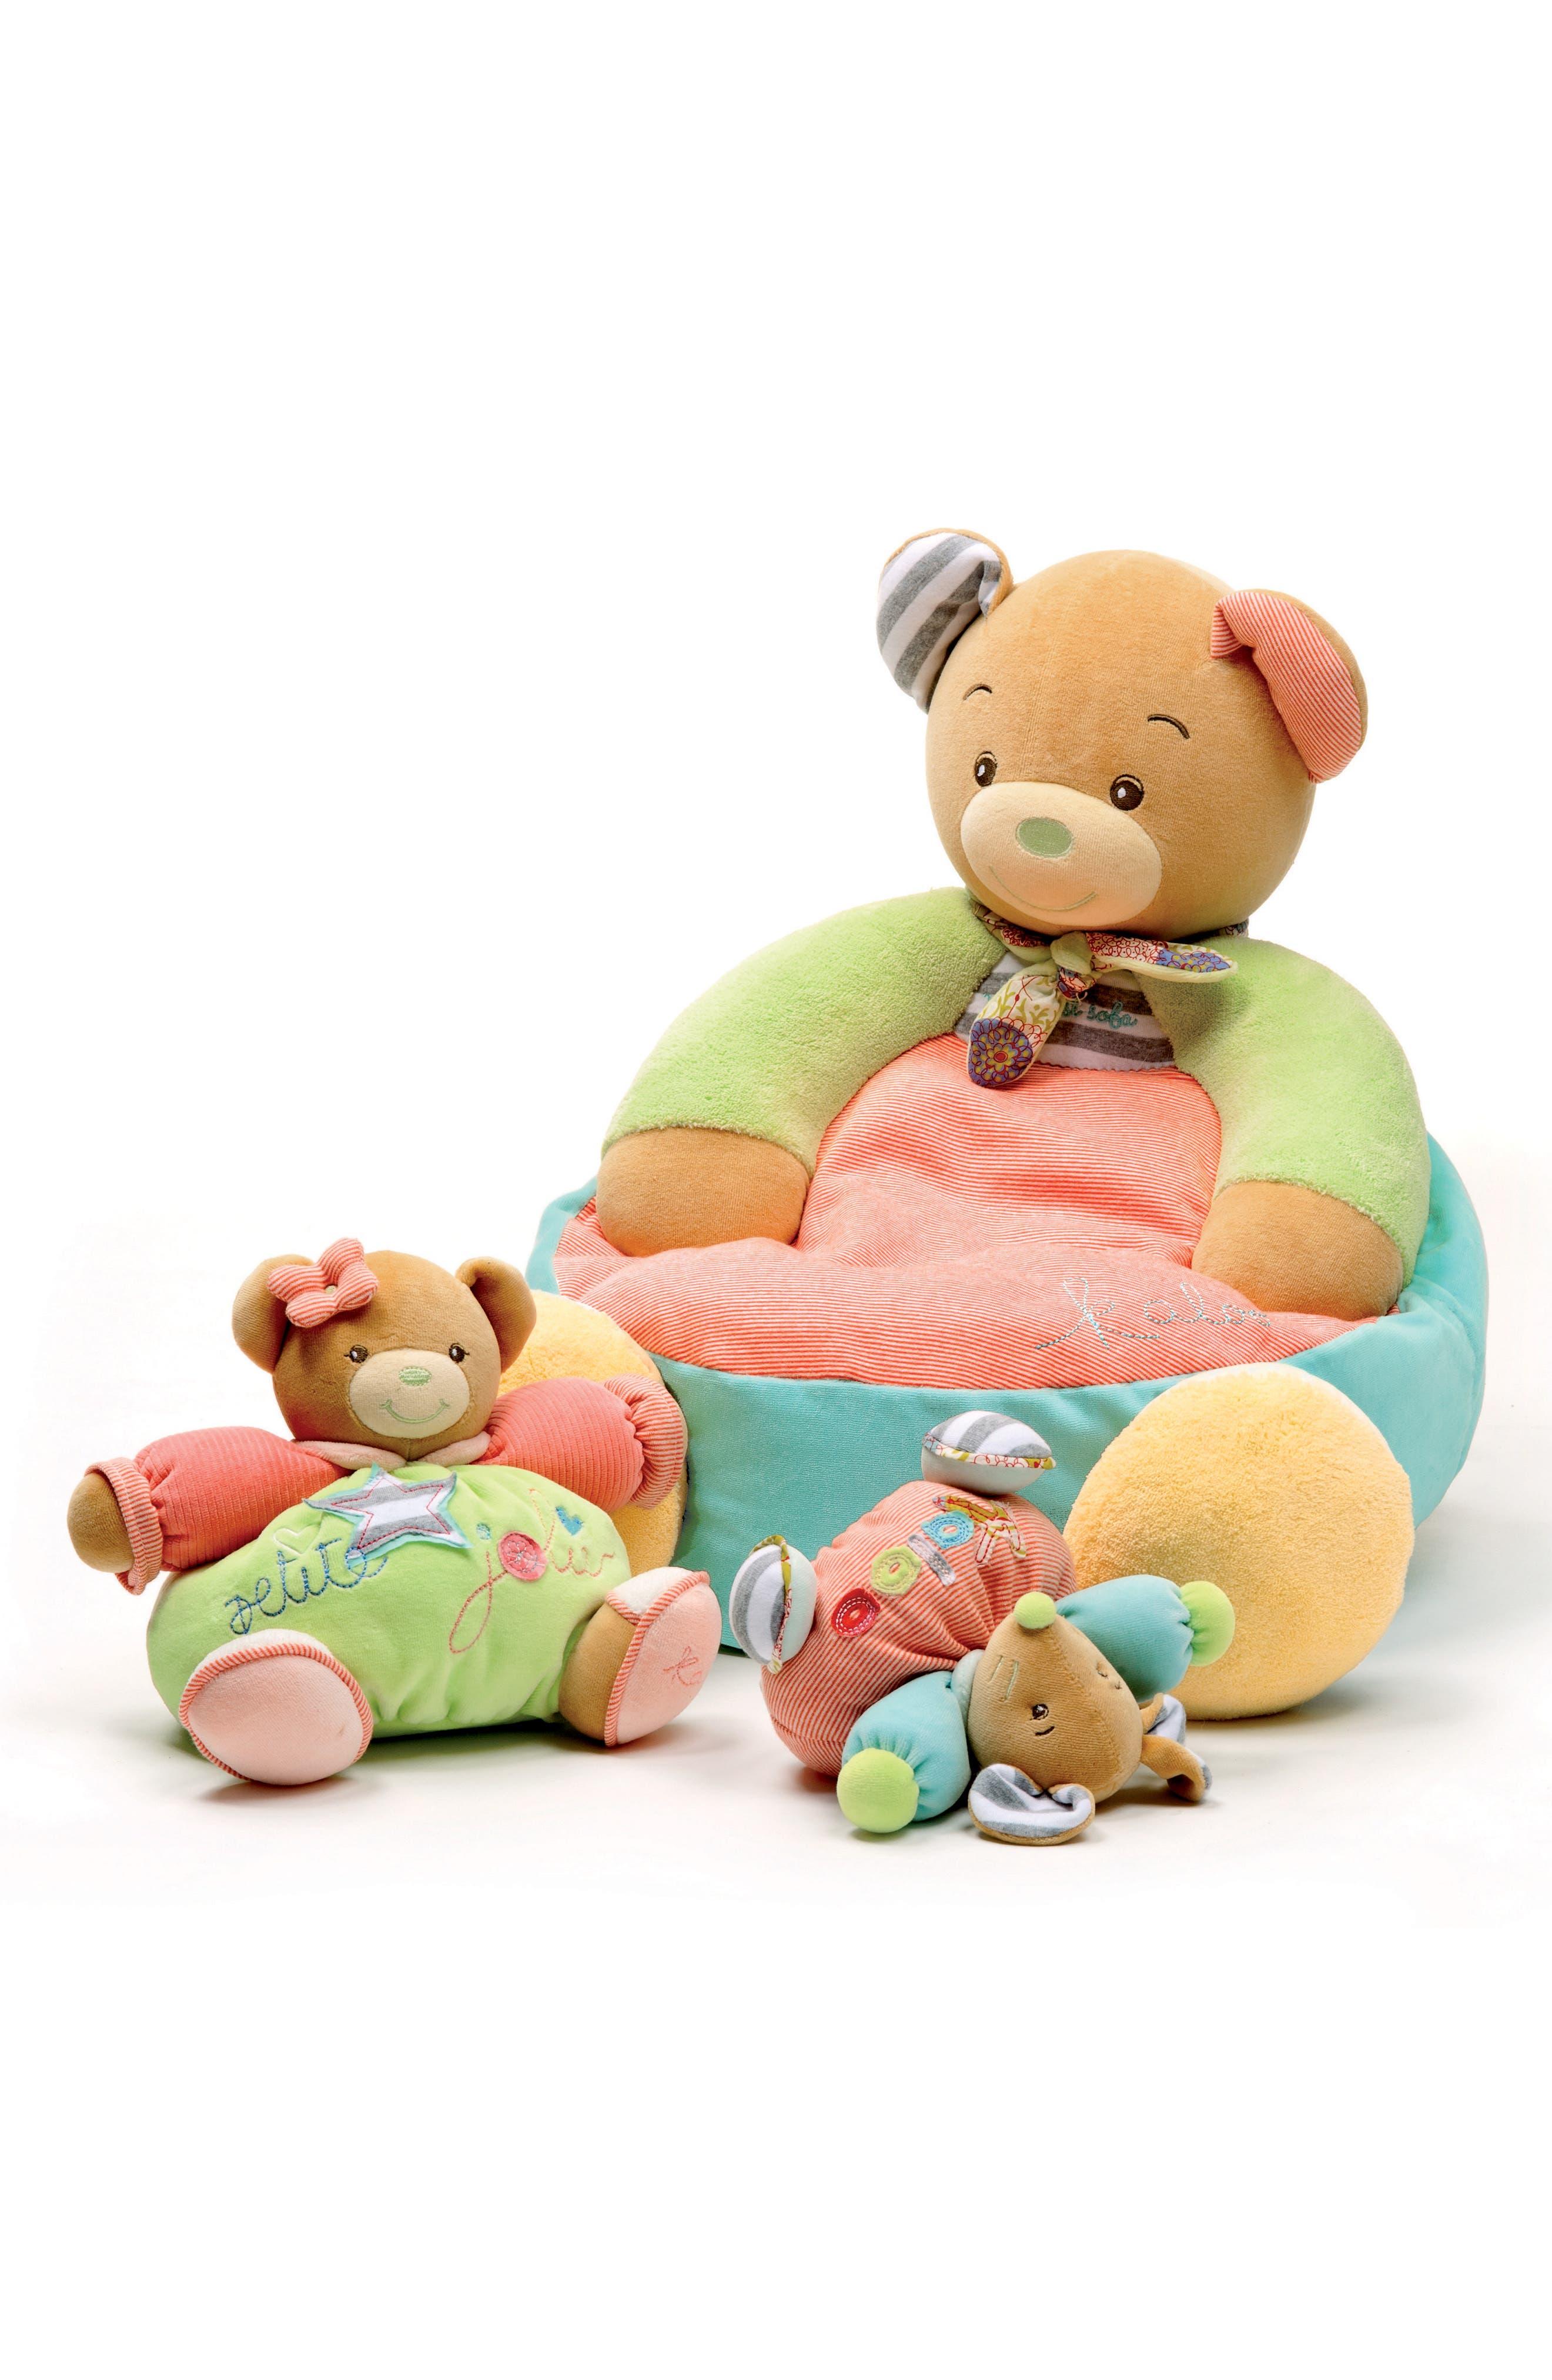 Alternate Image 1 Selected - Kaloo Bliss Bear Stuffed Animal